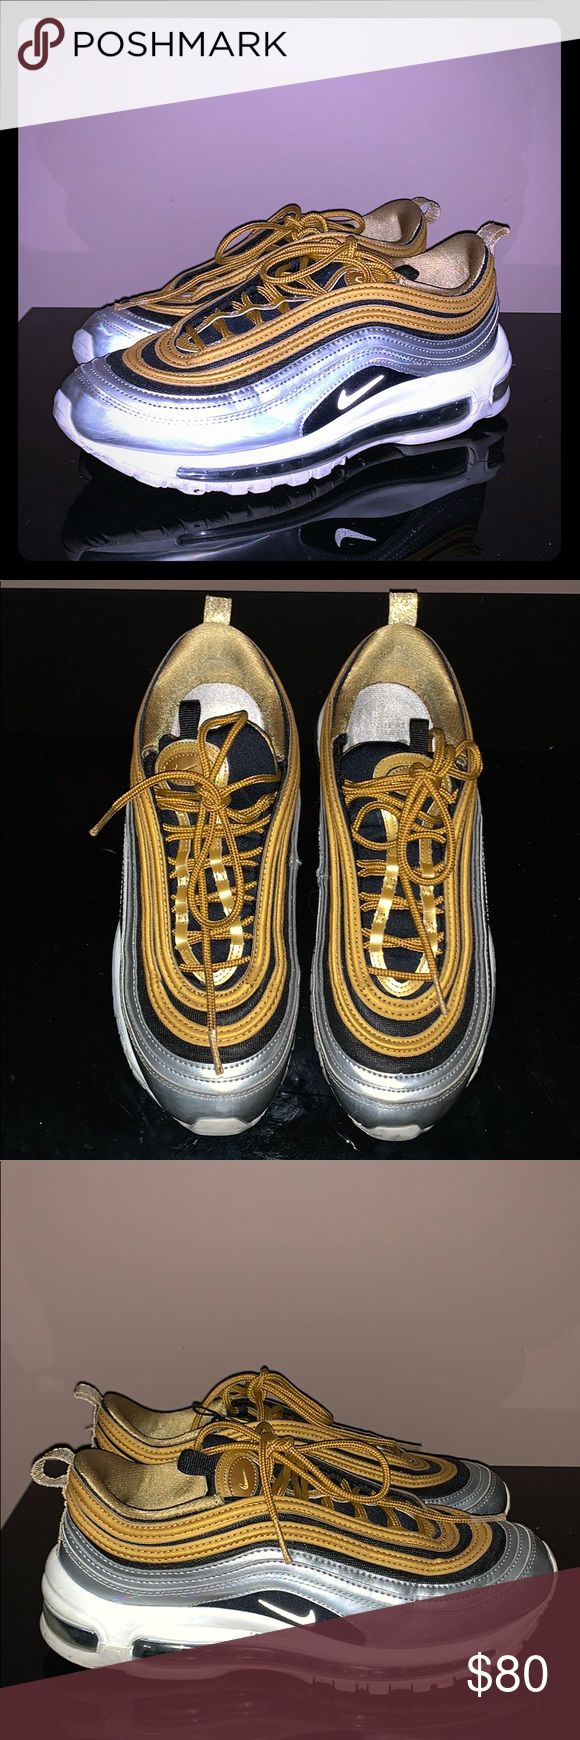 SOLD Nike Air Max 97 Nike air max 97, Air max 97, Nike